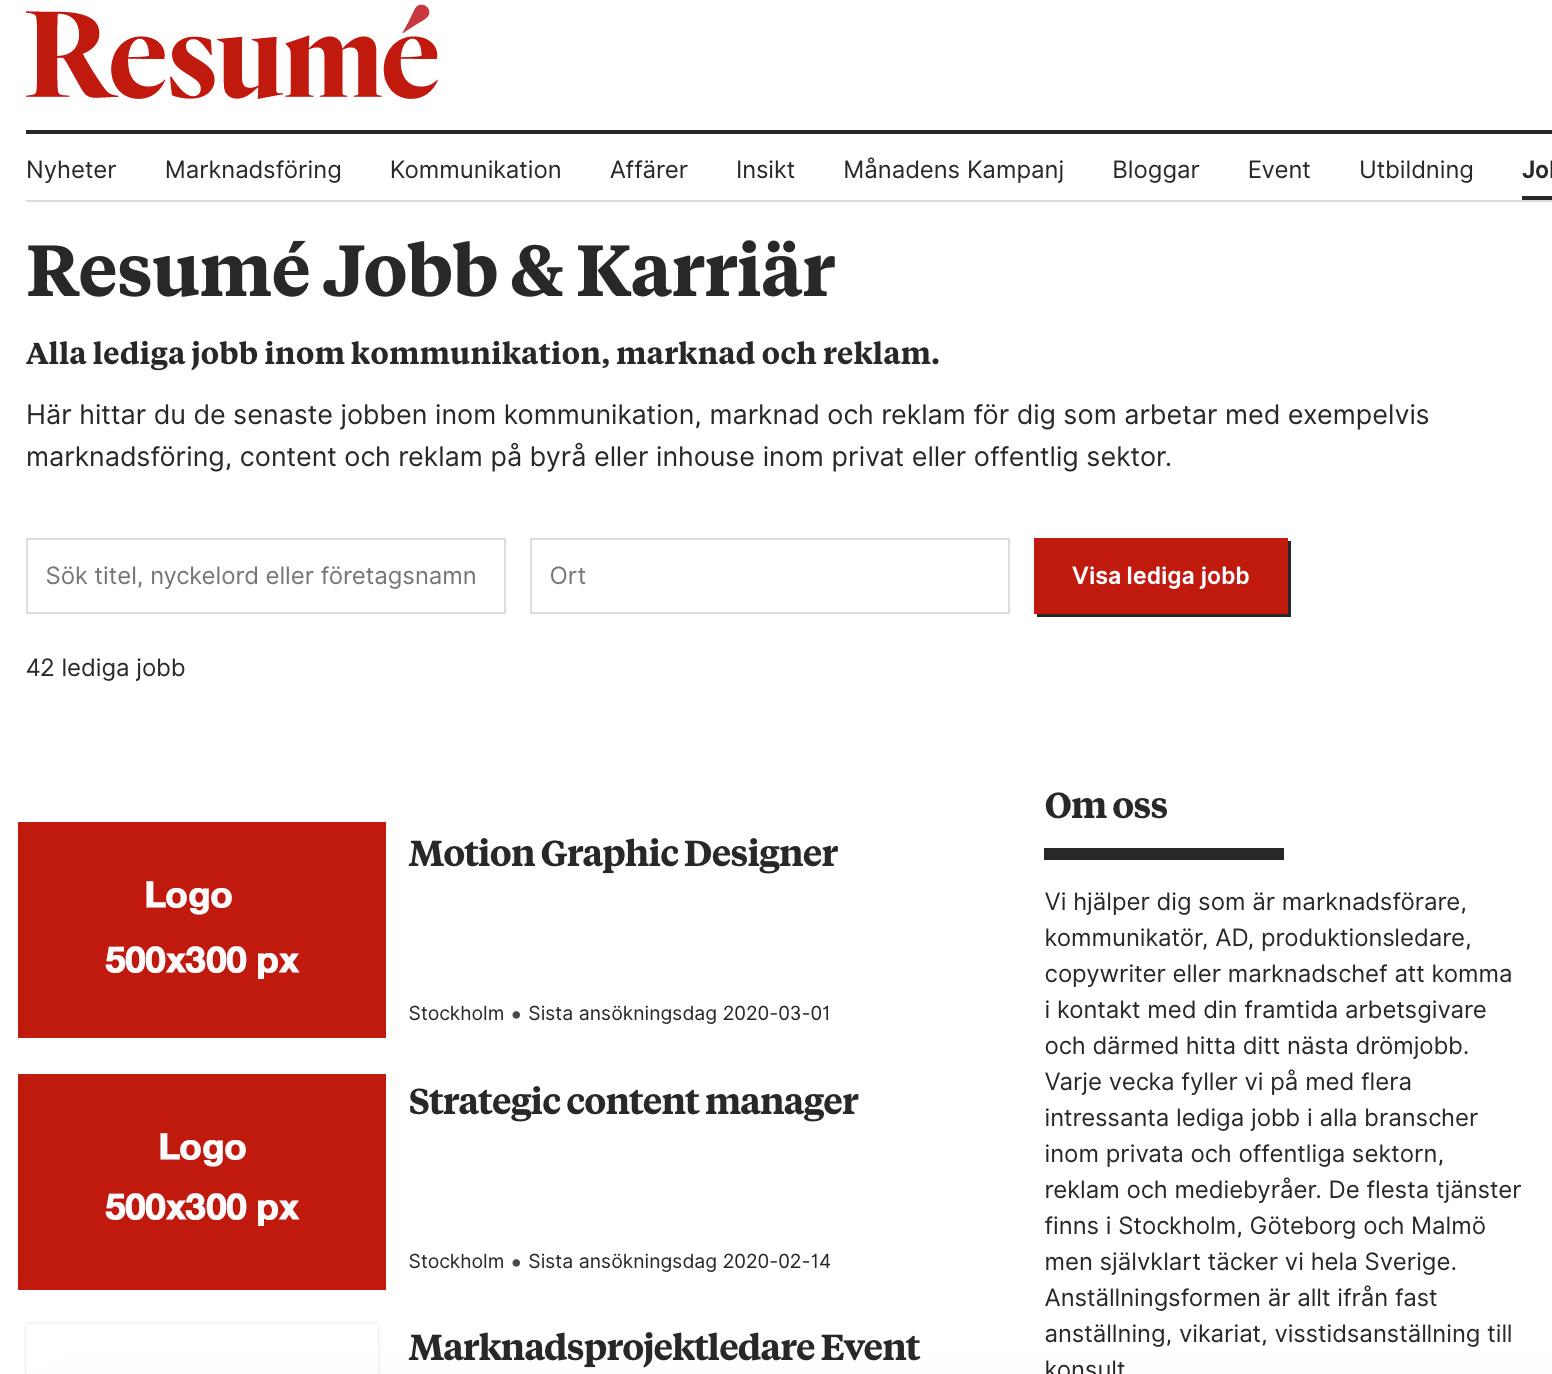 Resume.se/jobb 30 dagar